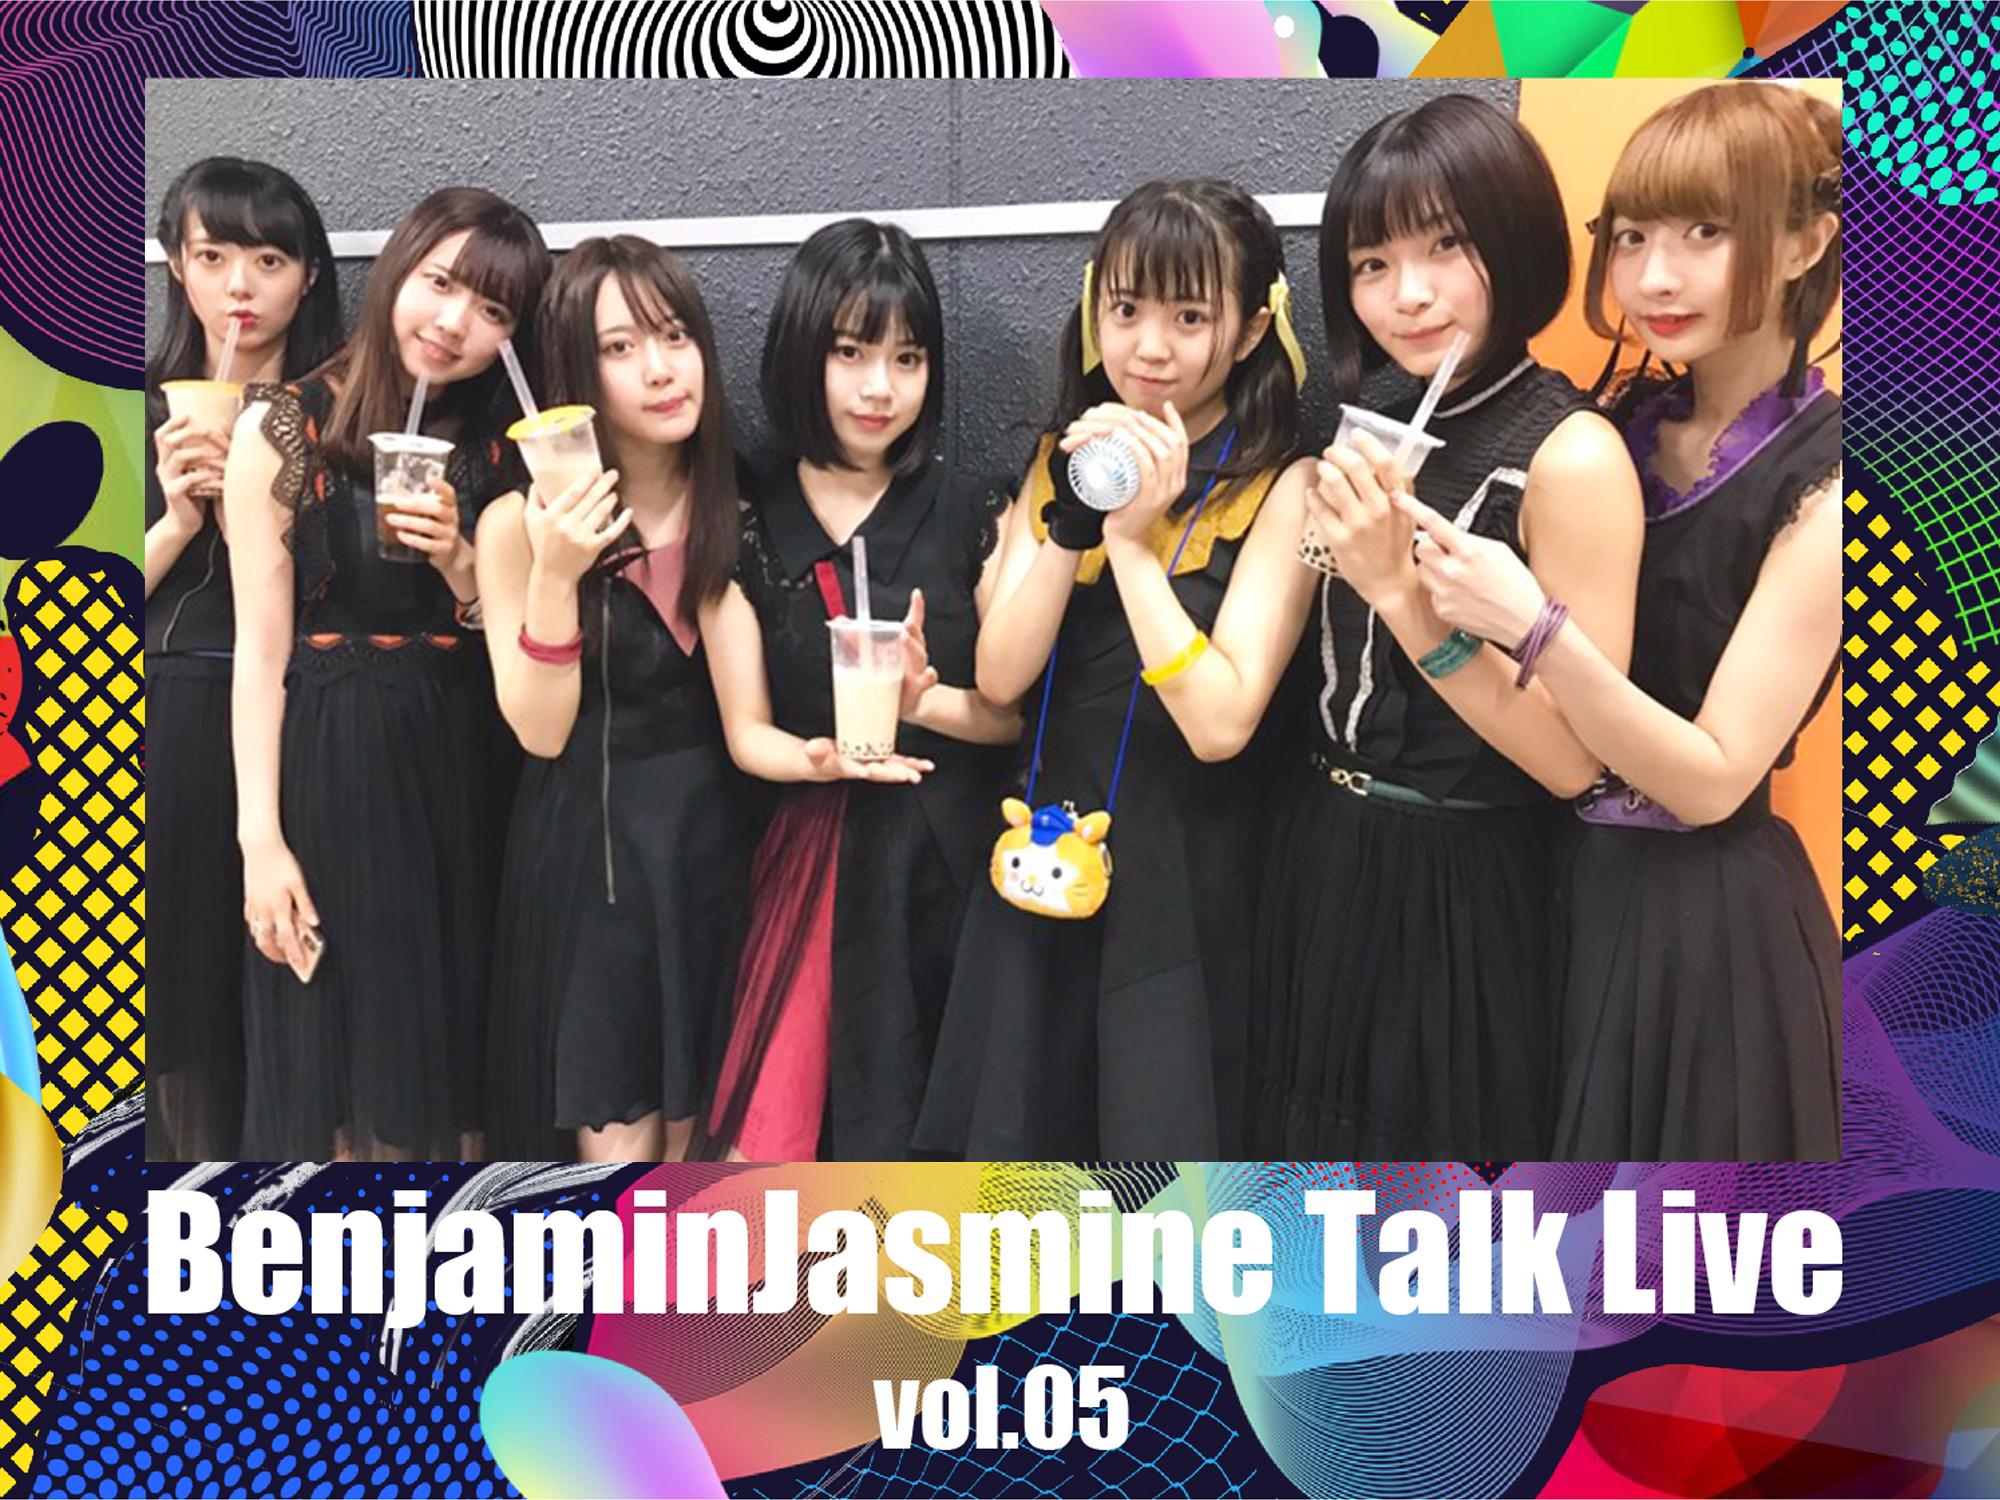 9月21日(土)『BenjaminJasmine Talk Live vol.05』開催決定